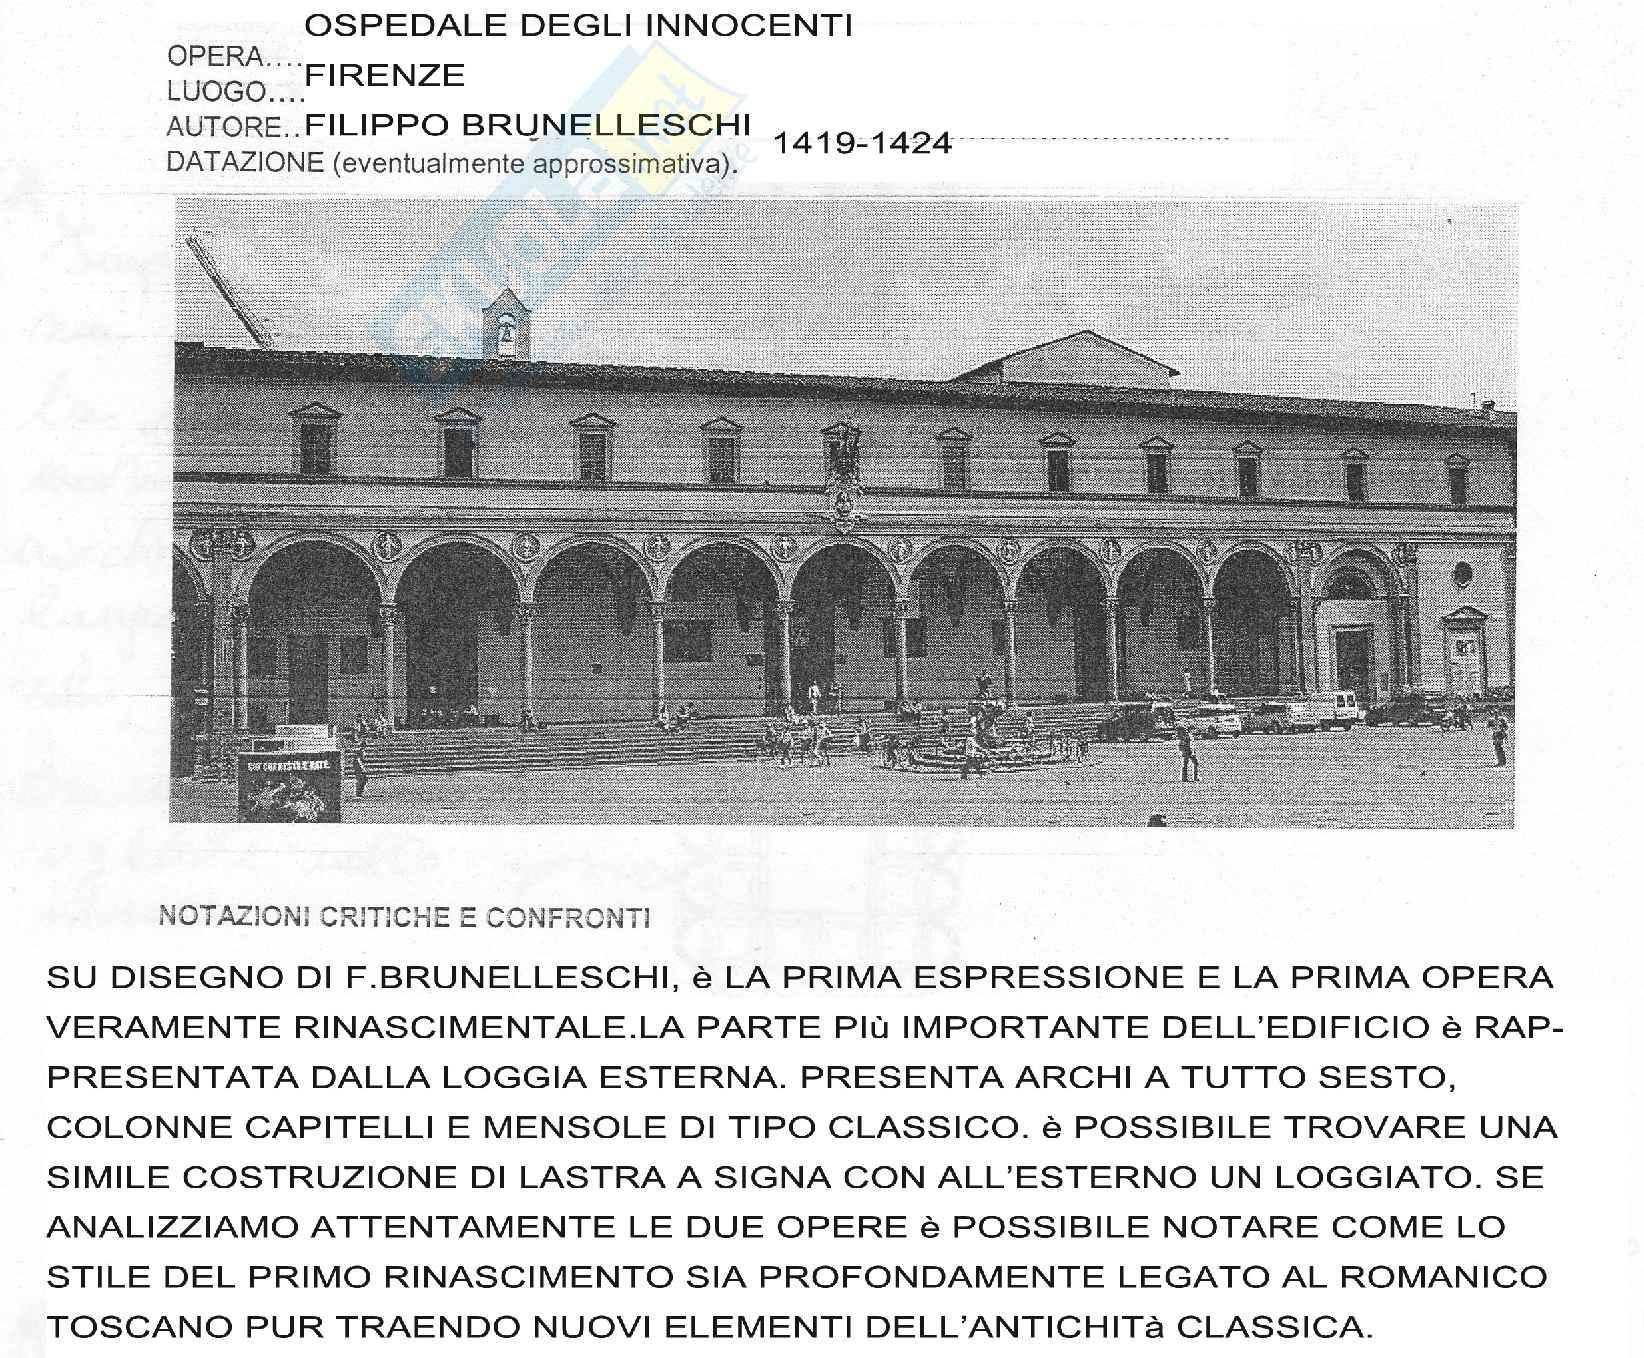 Filippo Brunelleschi, vita e opere Pag. 6